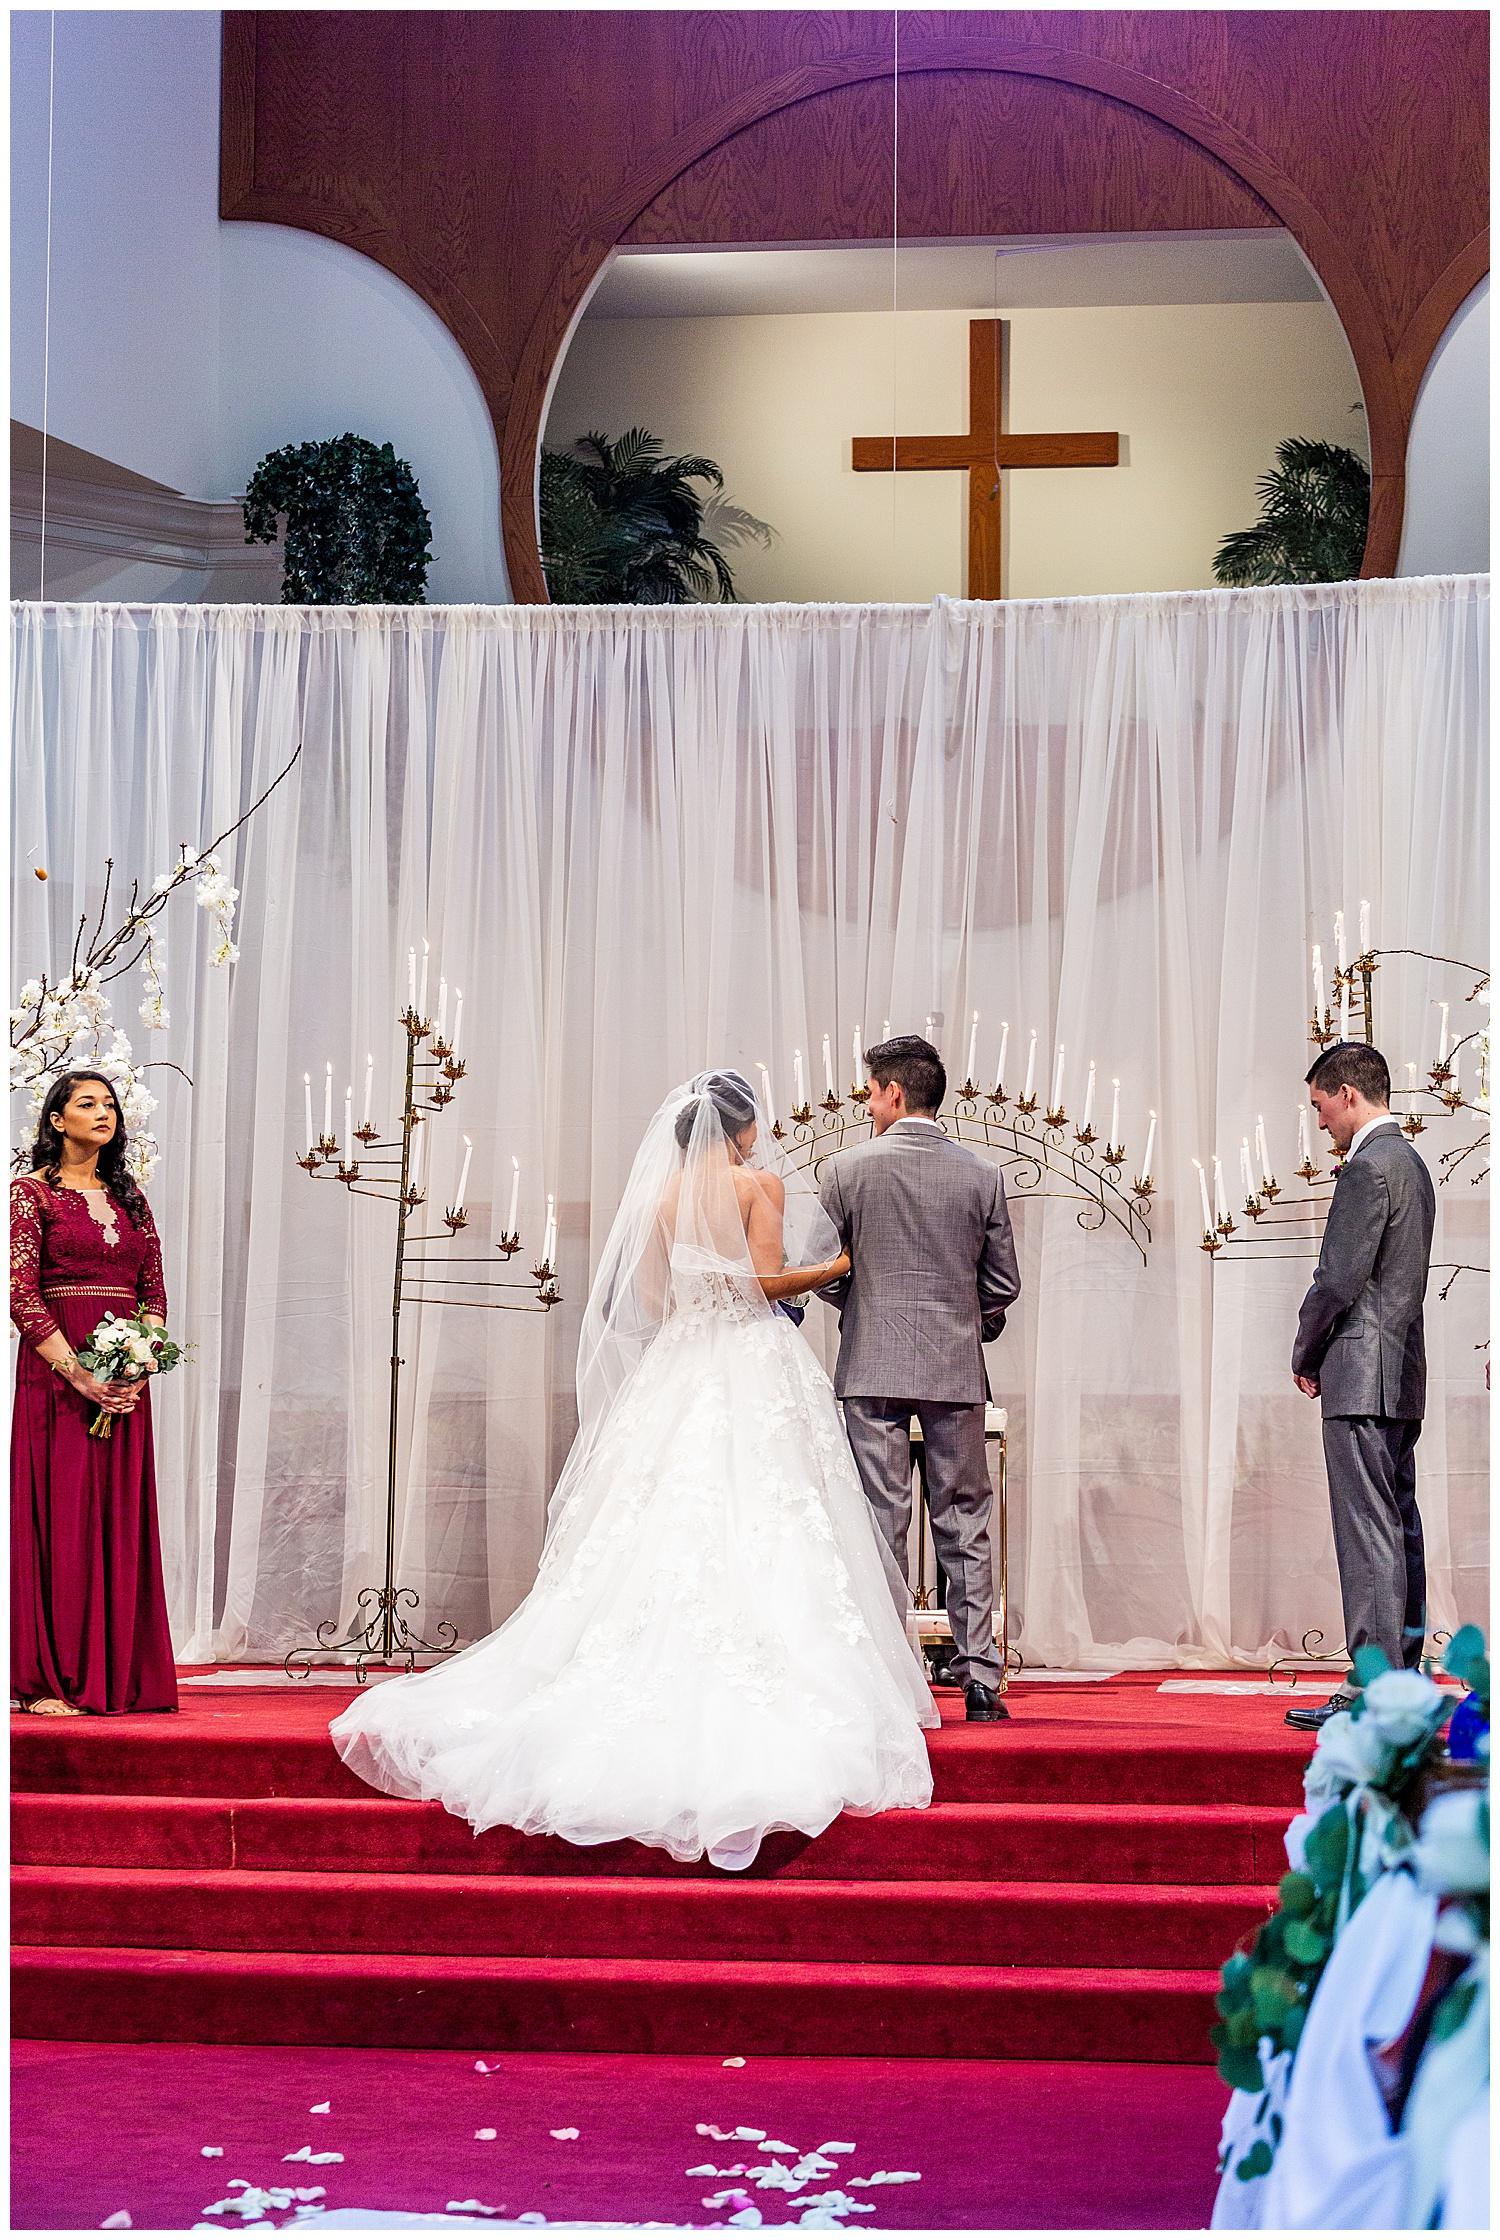 J+L Martins West Indian Wedding Living Radiant Photography photos_0043.jpg